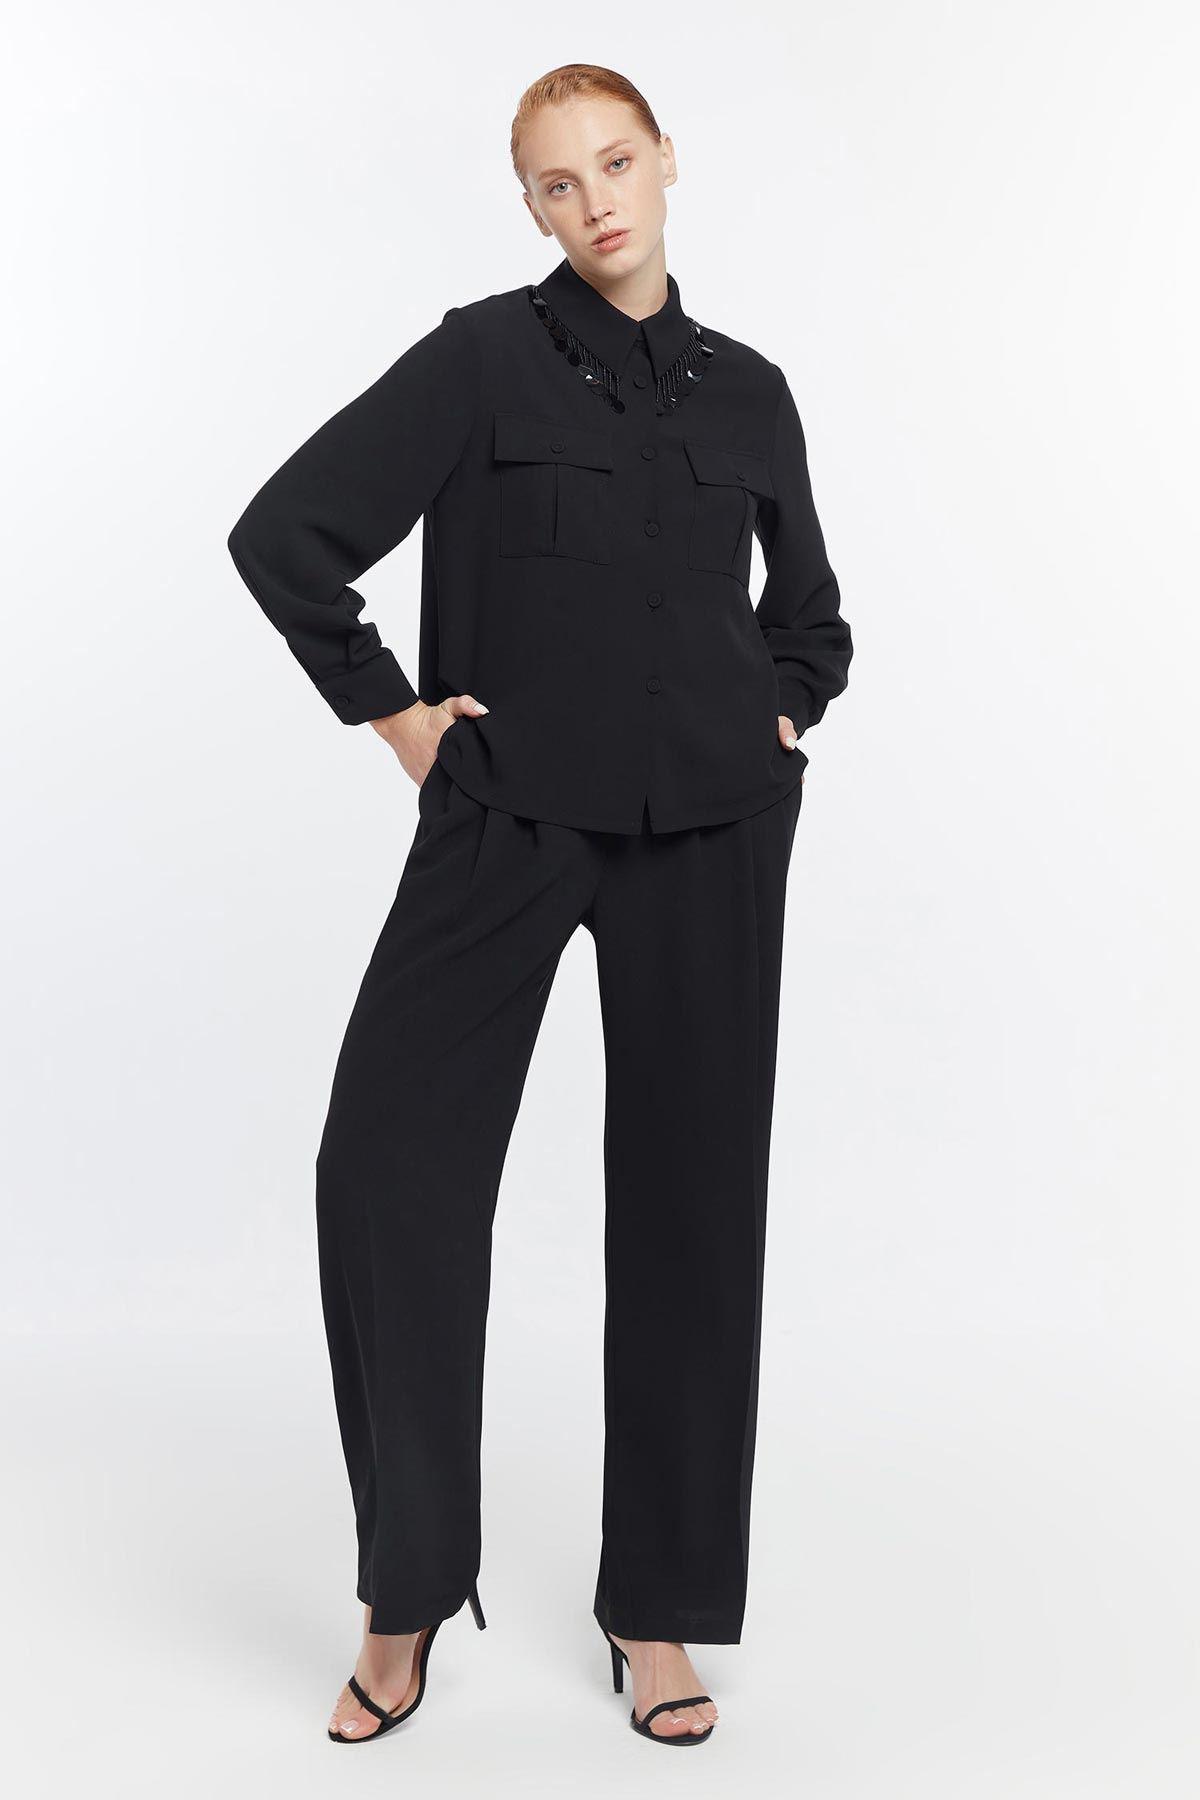 Yakada payet geçmeli gömlek Siyah